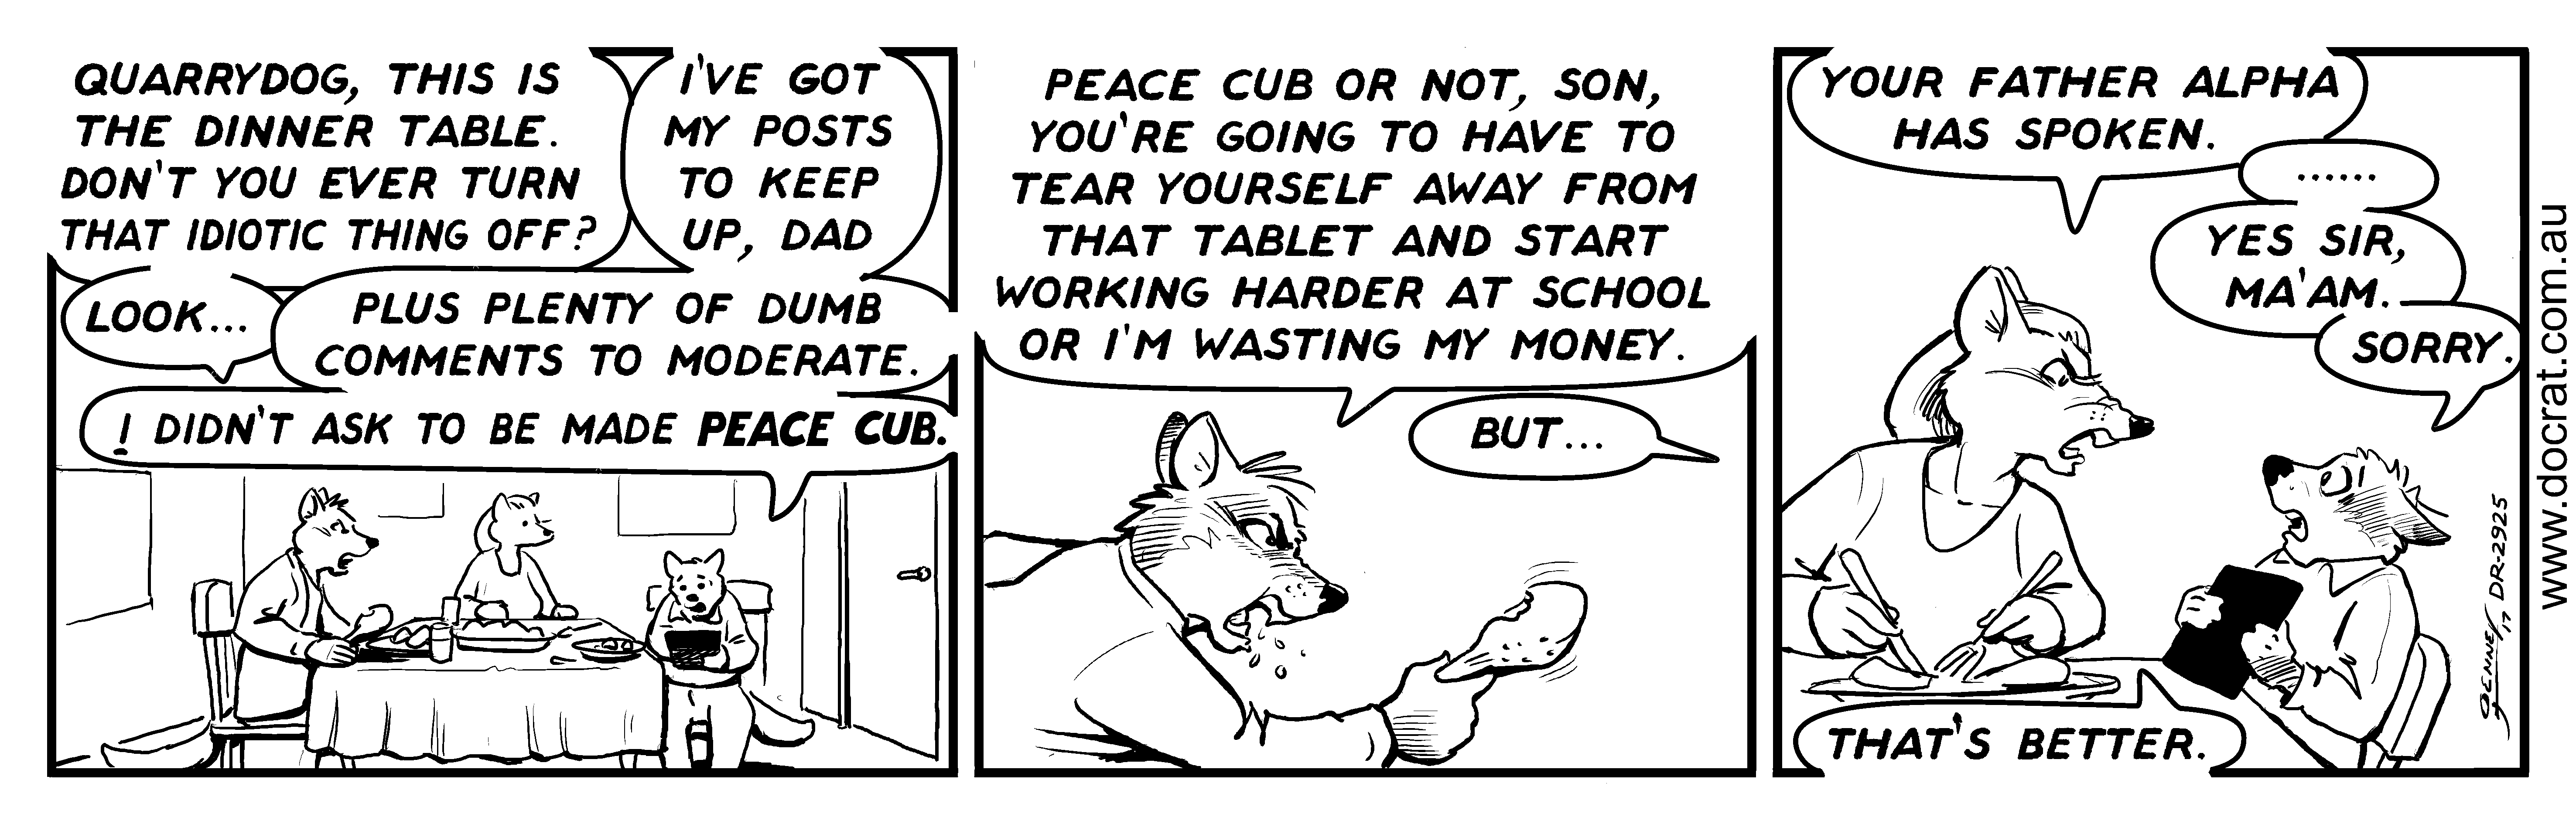 20171208